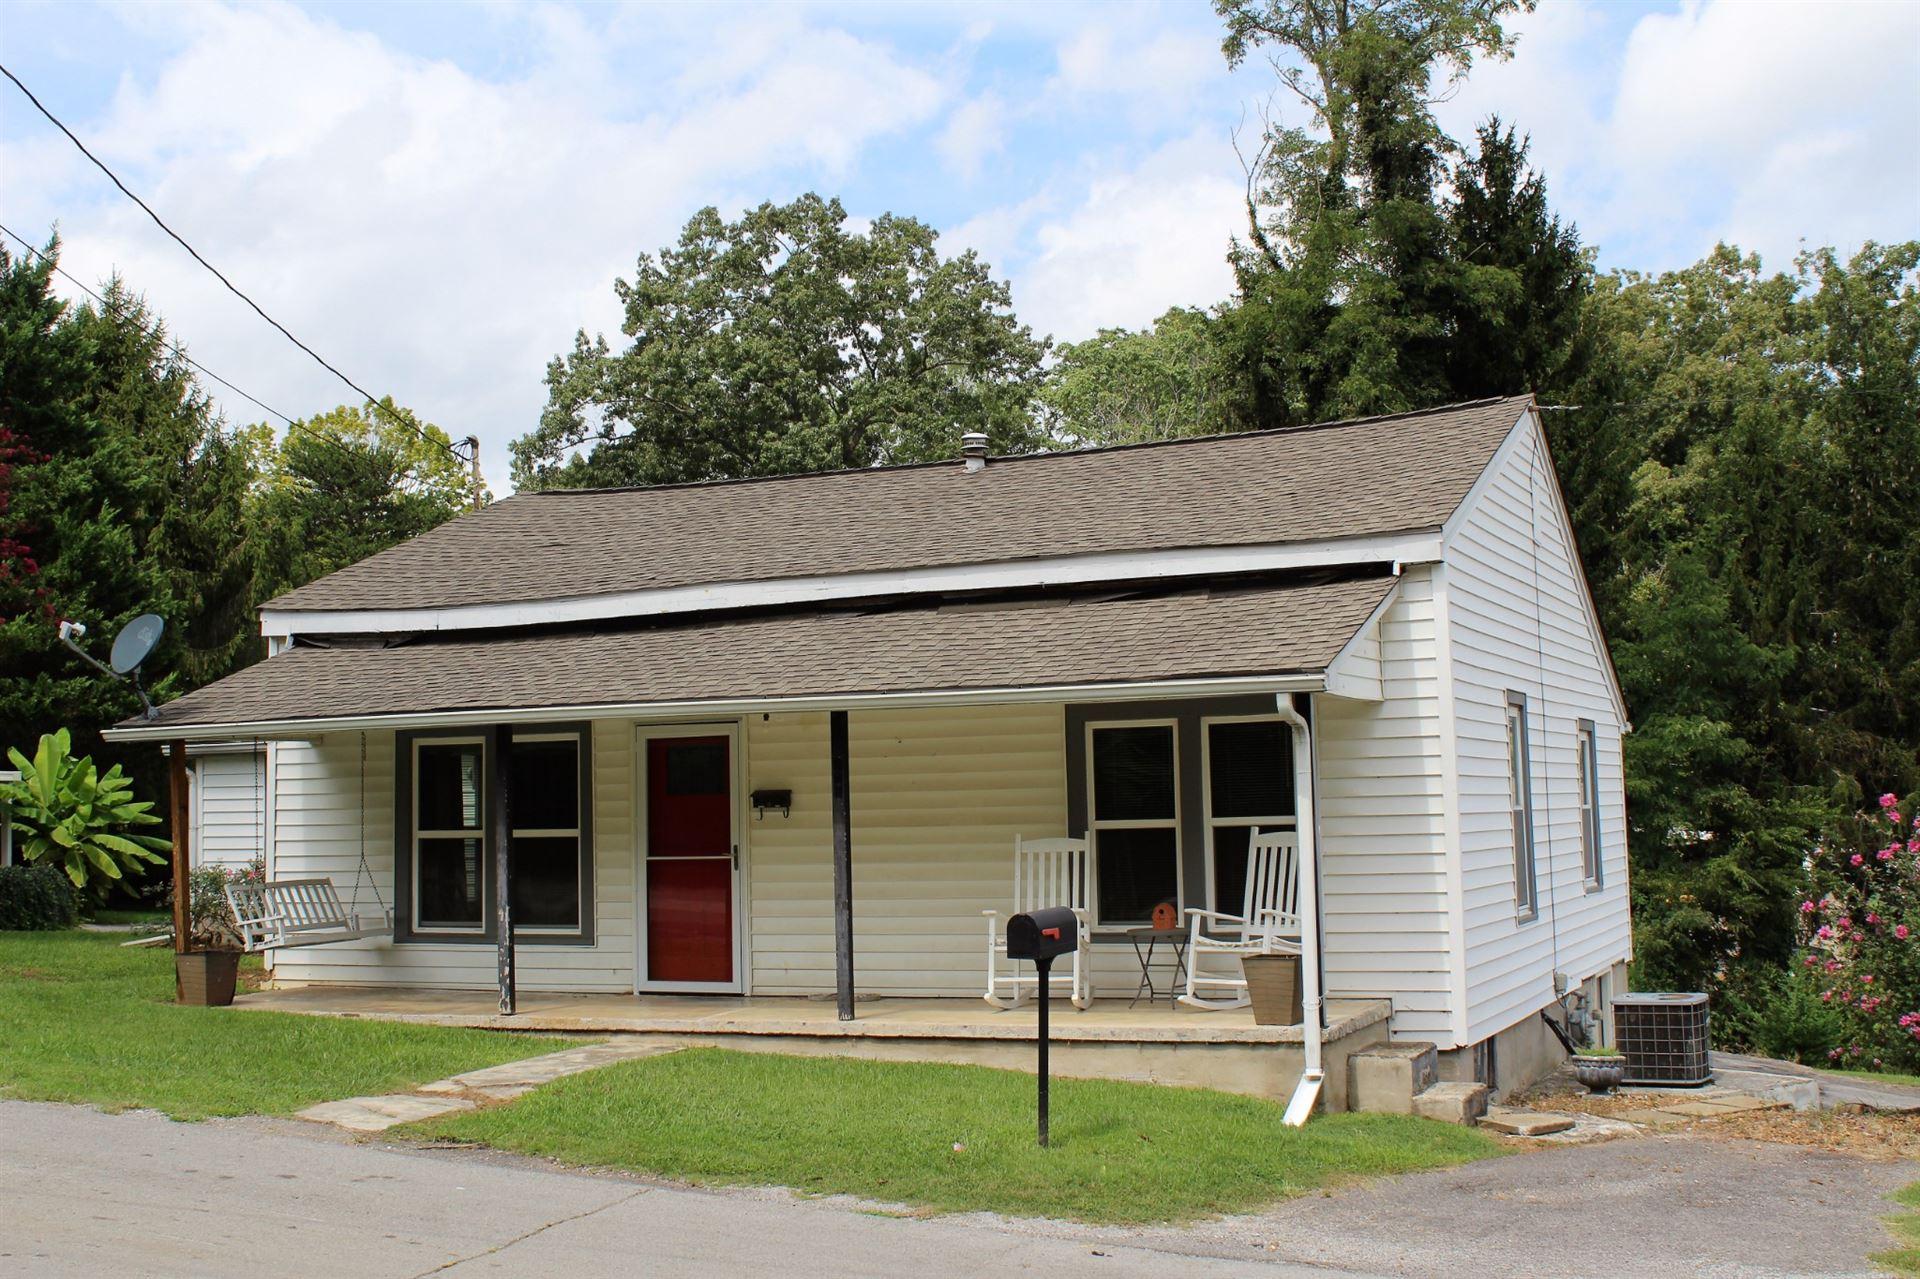 209 3rd Ave NE, Winchester, TN 37398 - MLS#: 2290542